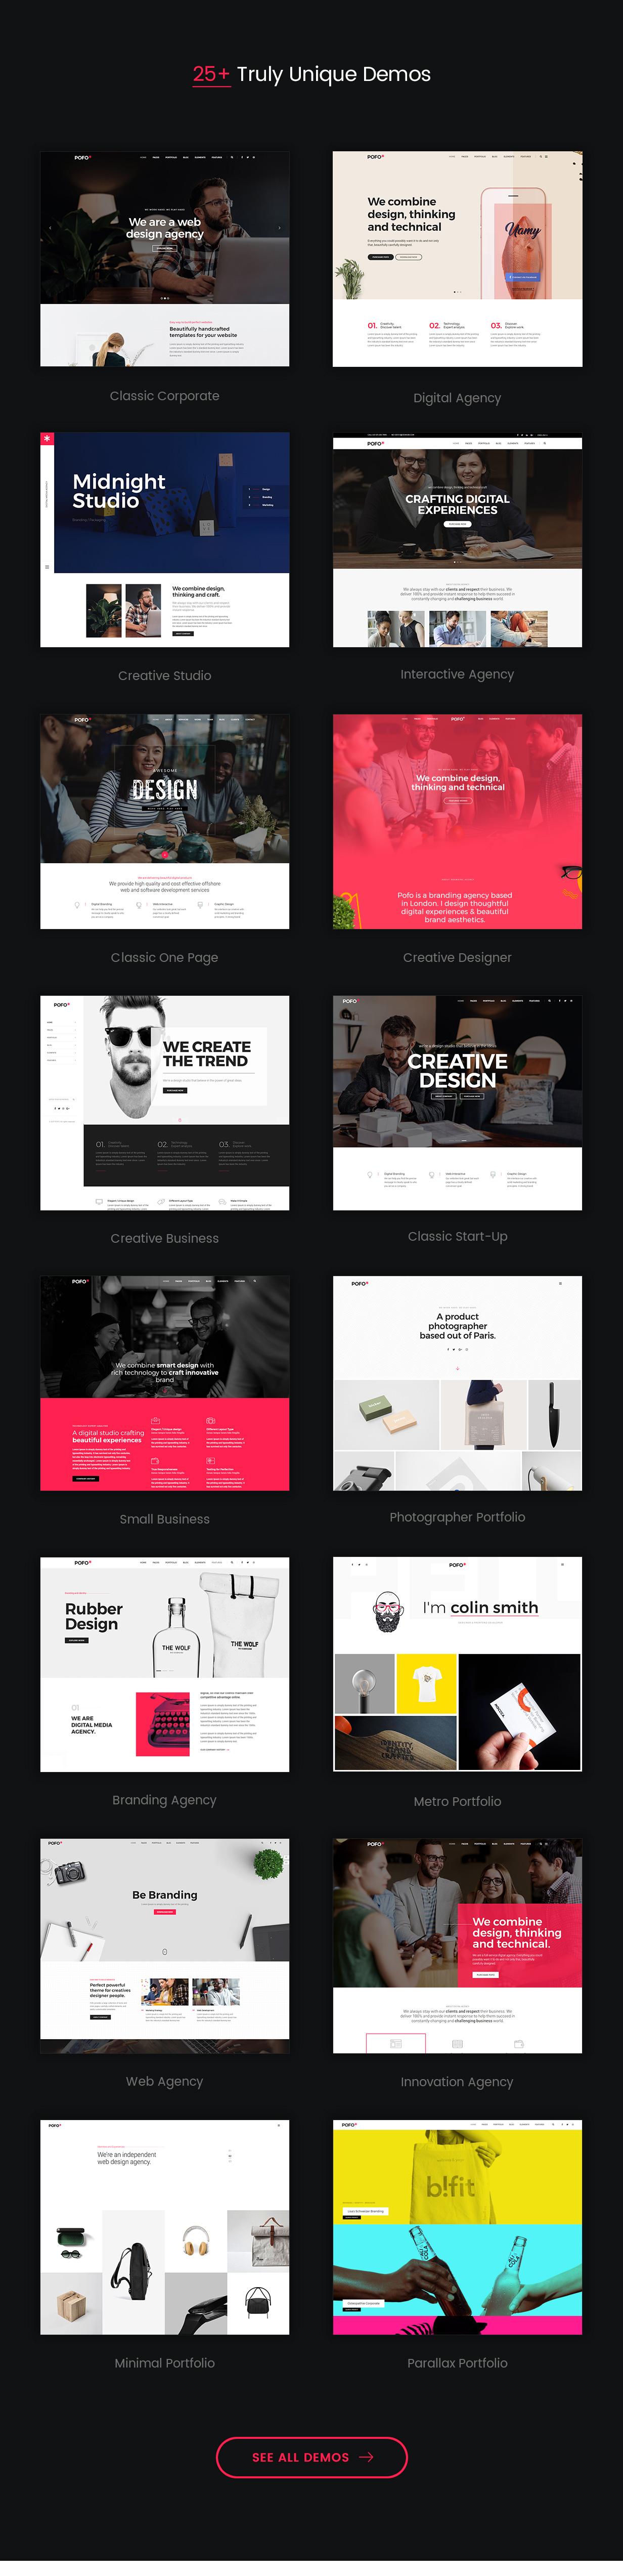 Pofo - Creative Portfolio and Blog WordPress Theme - 6